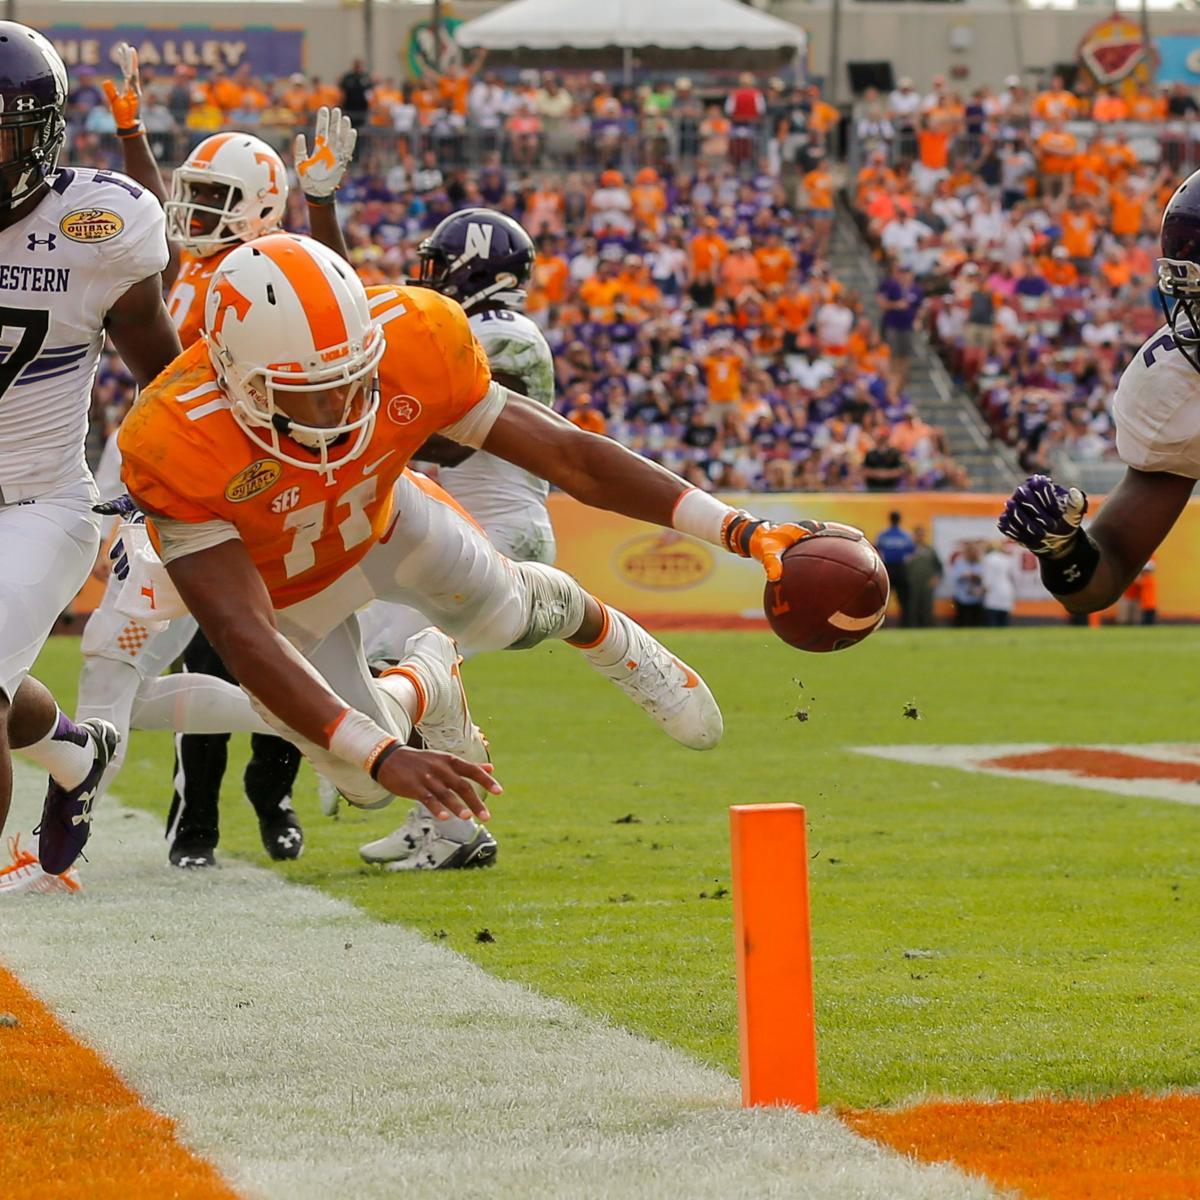 Tennessee Football: Realistic Goals for Quarterback Joshua Dobbs in 2016 | Bleacher Report ...